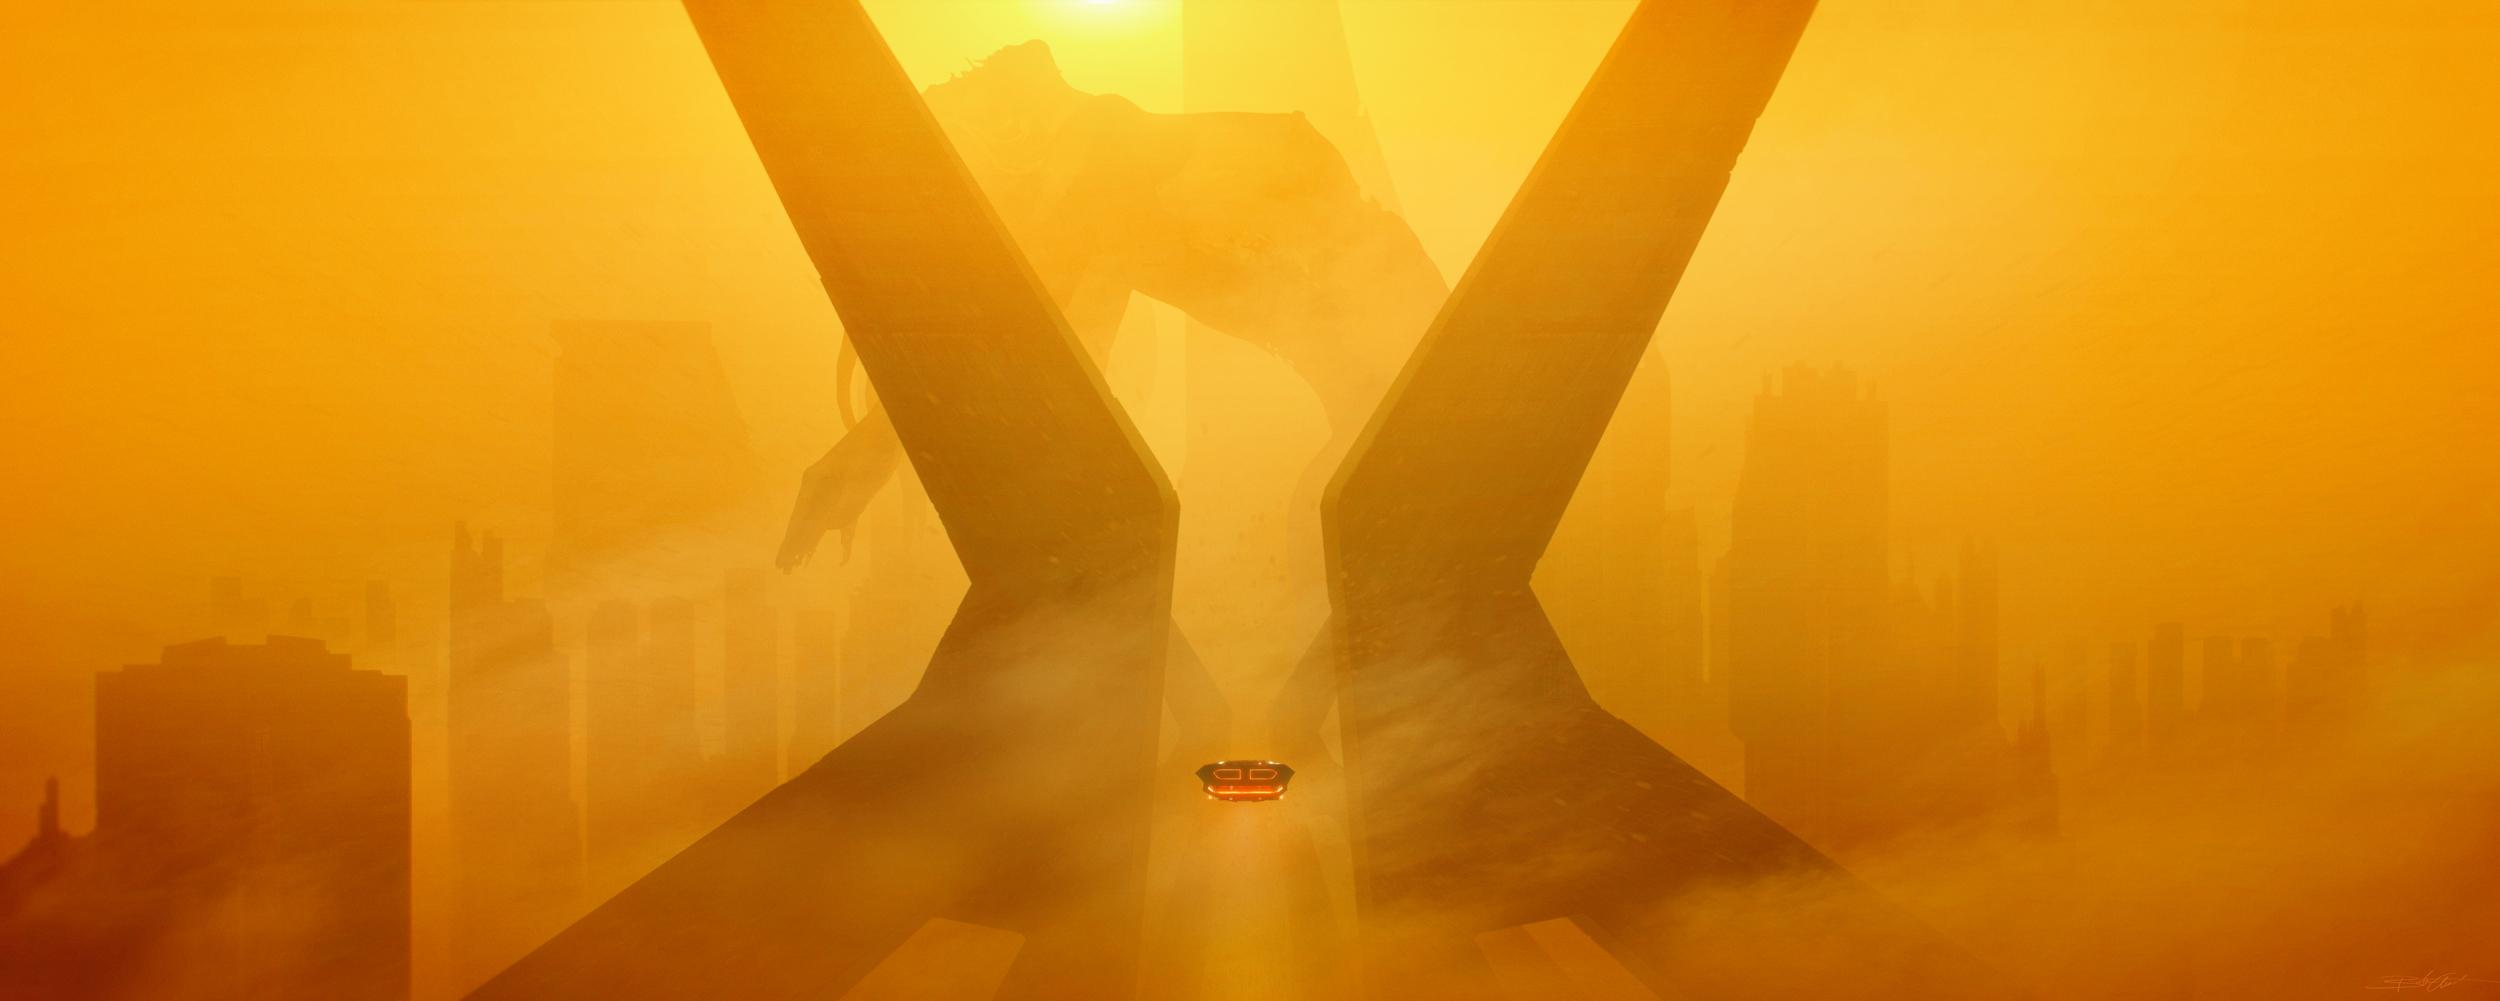 Blade Runner 2049 Wallpapers From Trailer 1920x1080: Blade Runner 2049 Fan Artwork, HD Movies, 4k Wallpapers